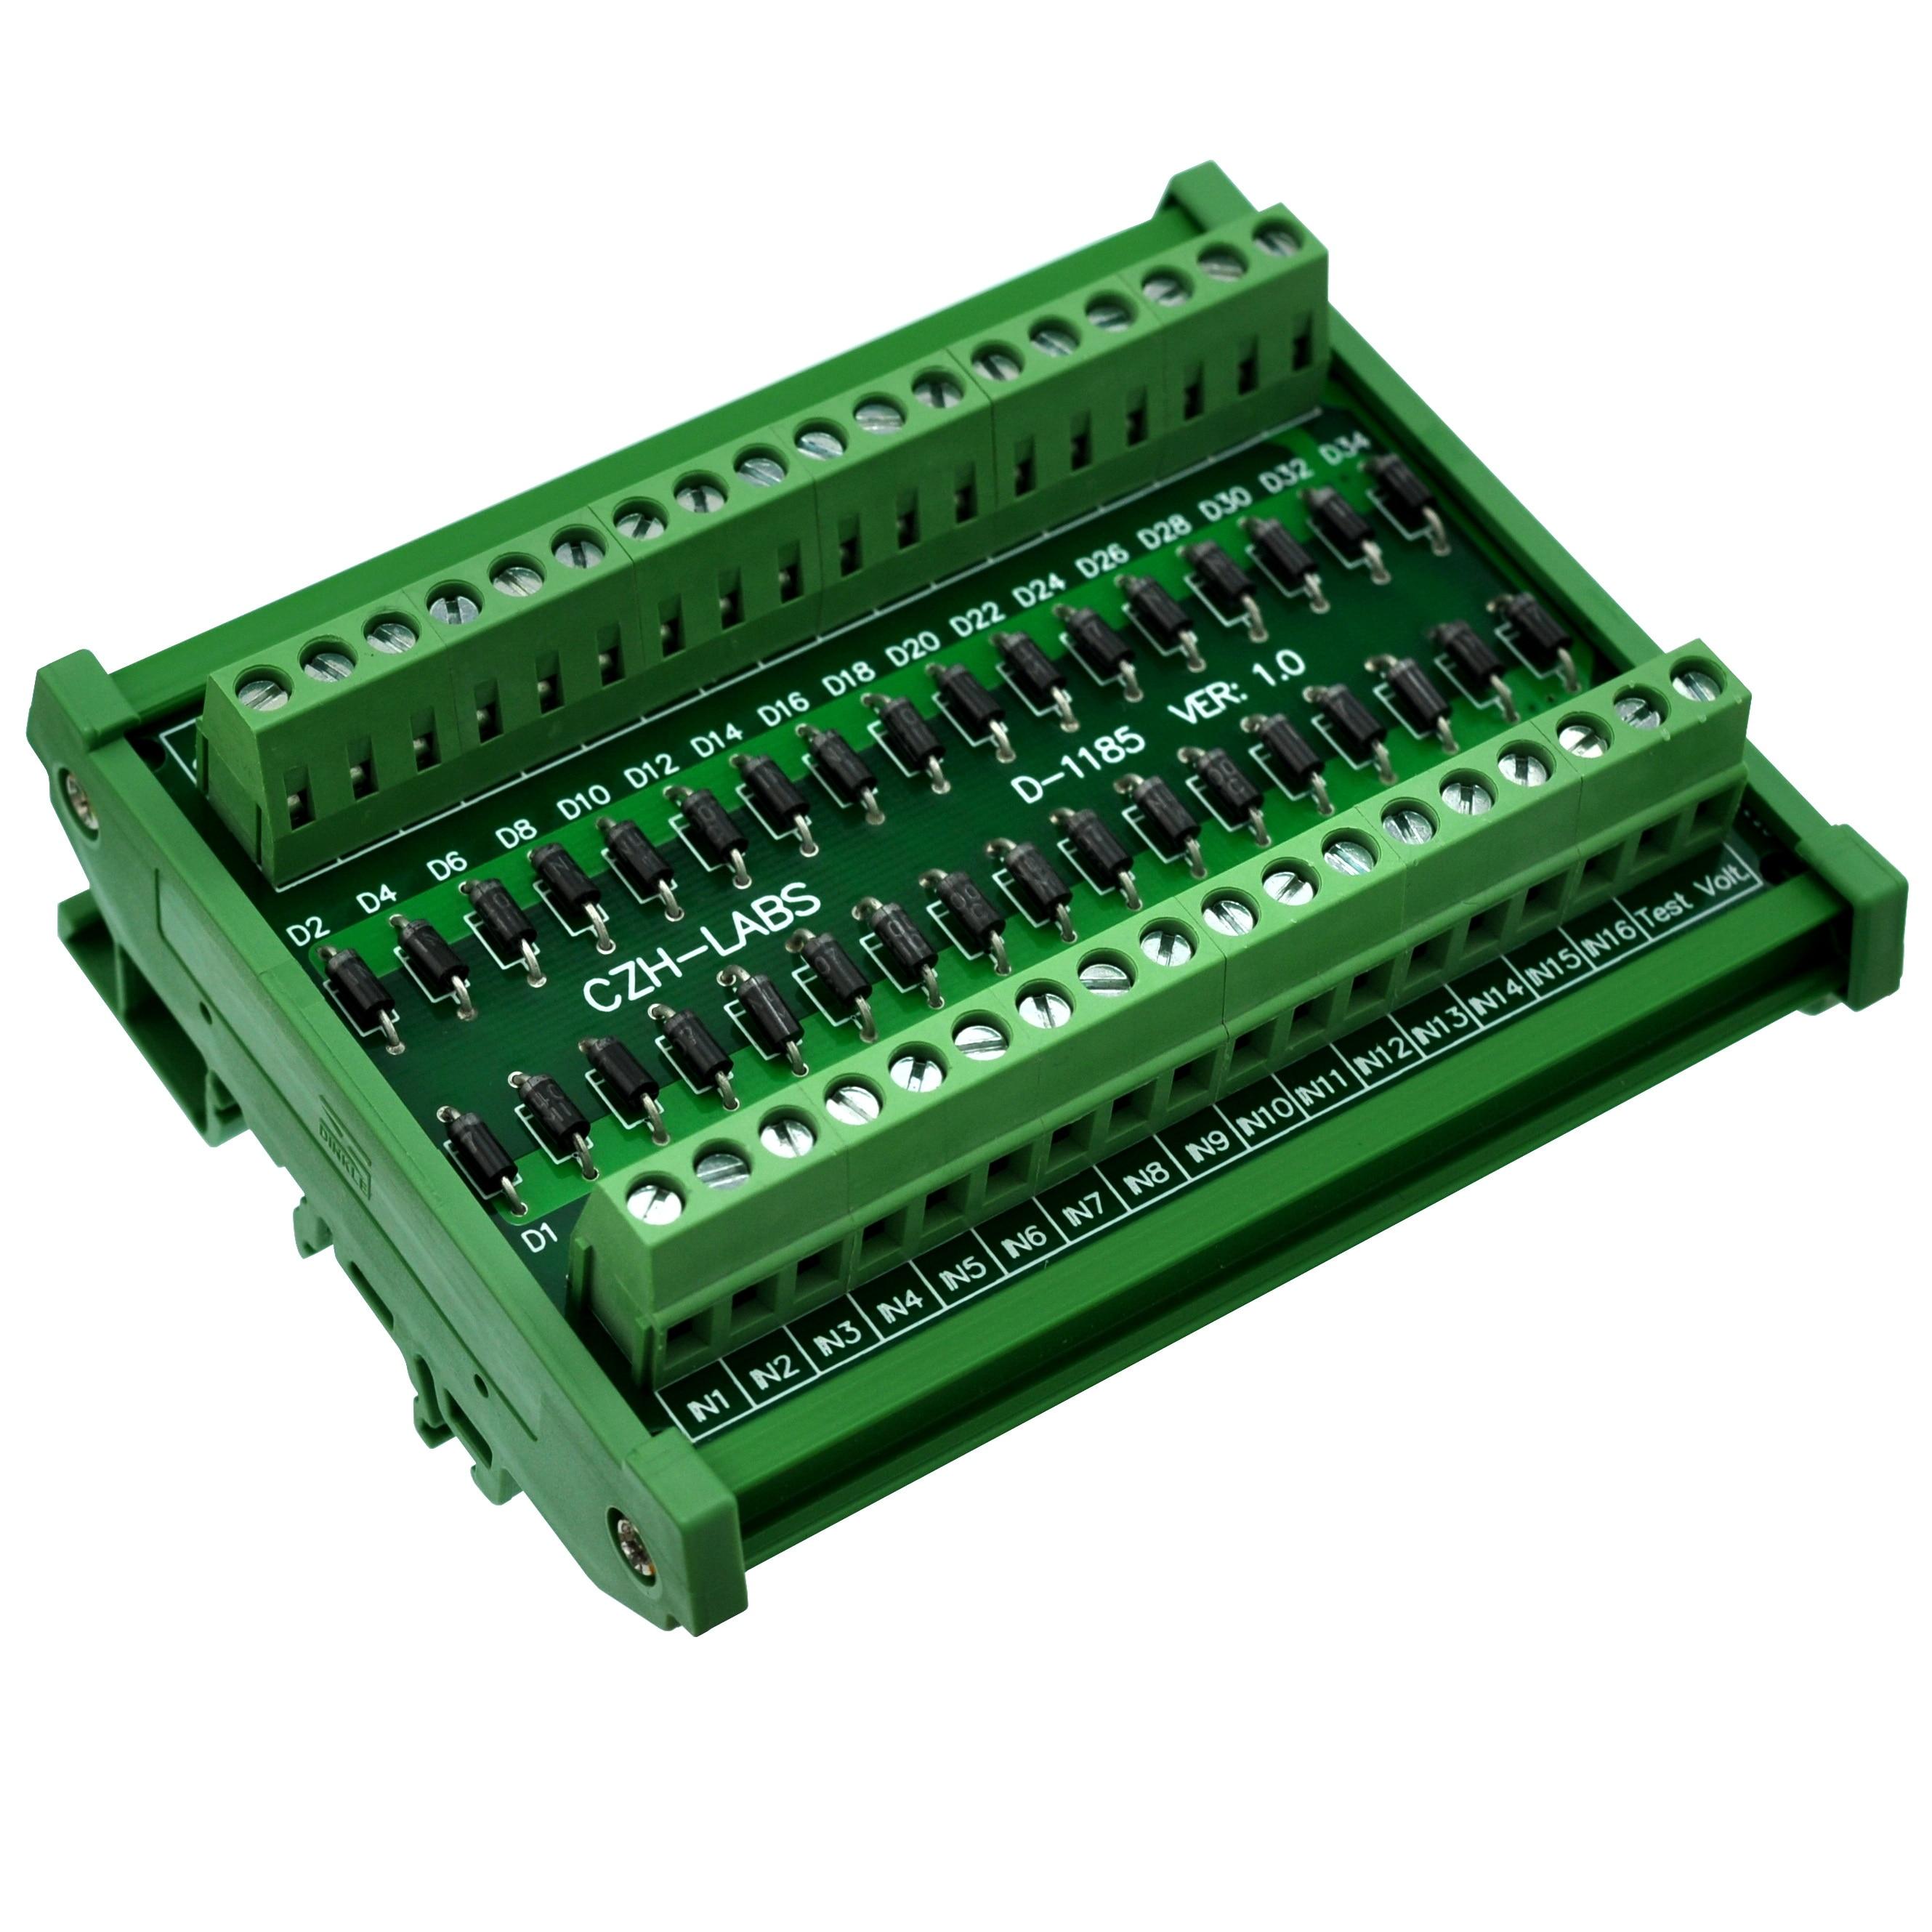 CZH-LABS DIN Rail Mount AC Lamp Test Diode Module, 16 Channels.